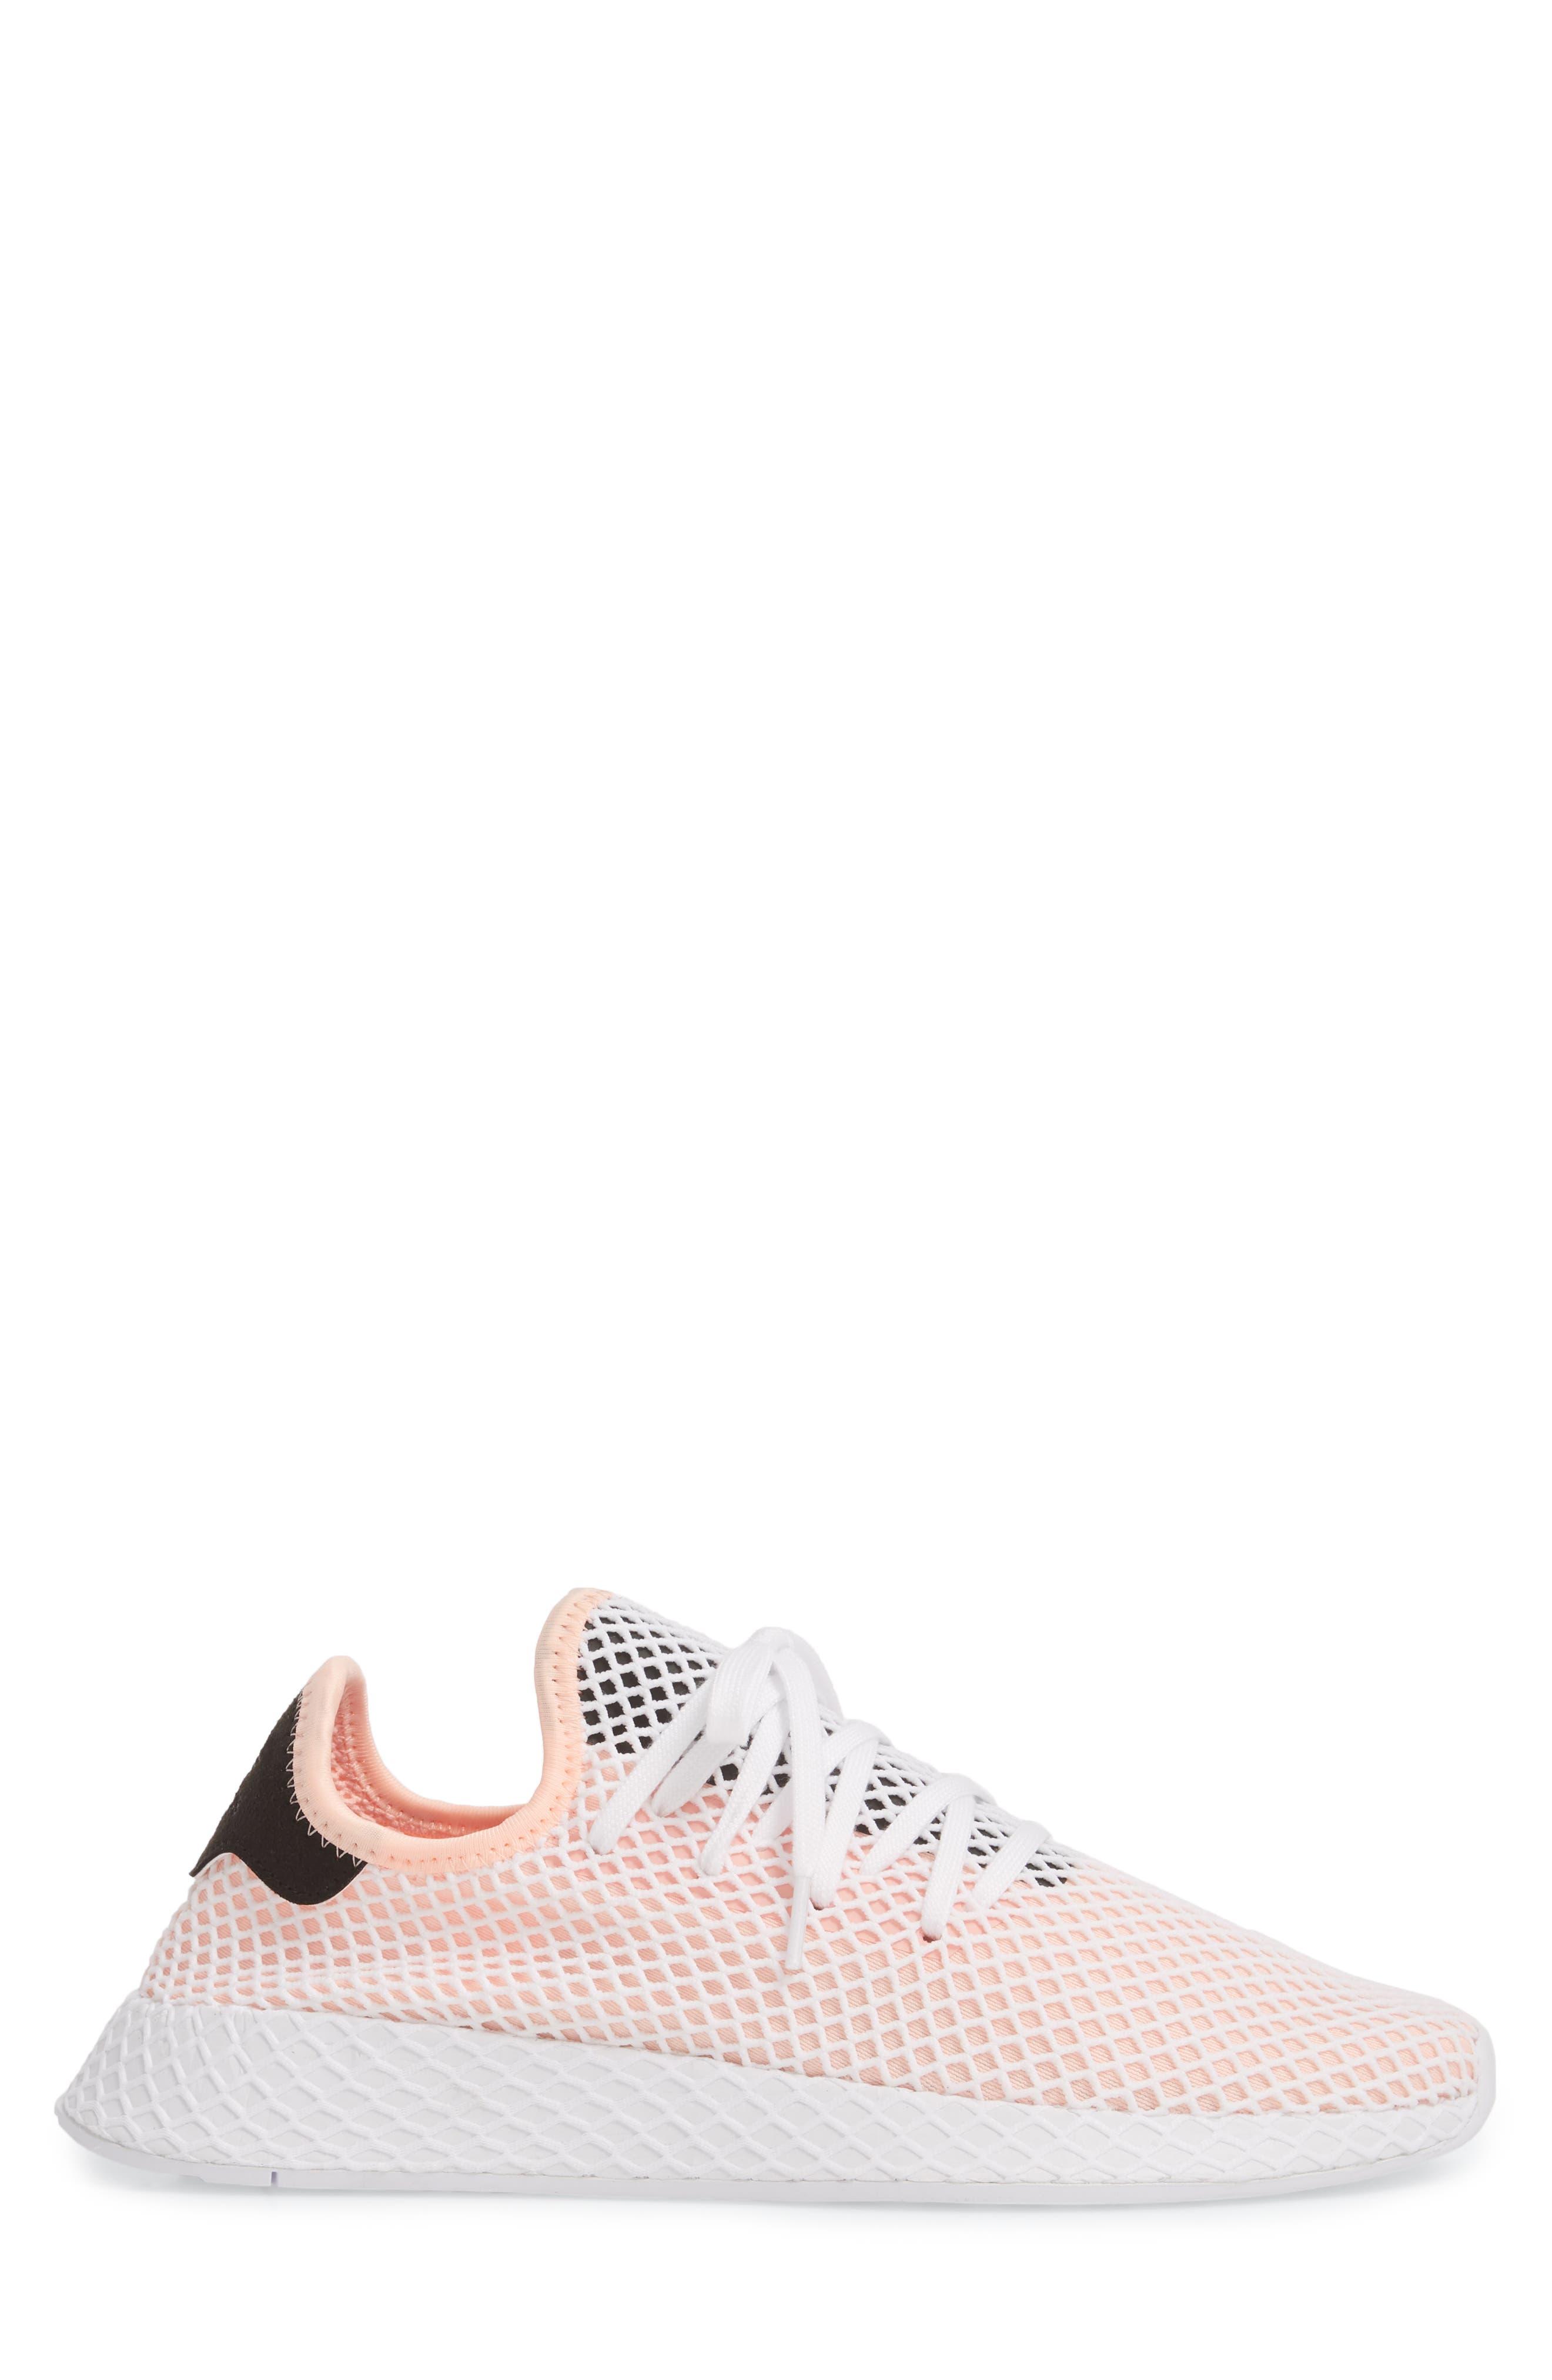 Deerupt Runner Sneaker,                             Alternate thumbnail 30, color,